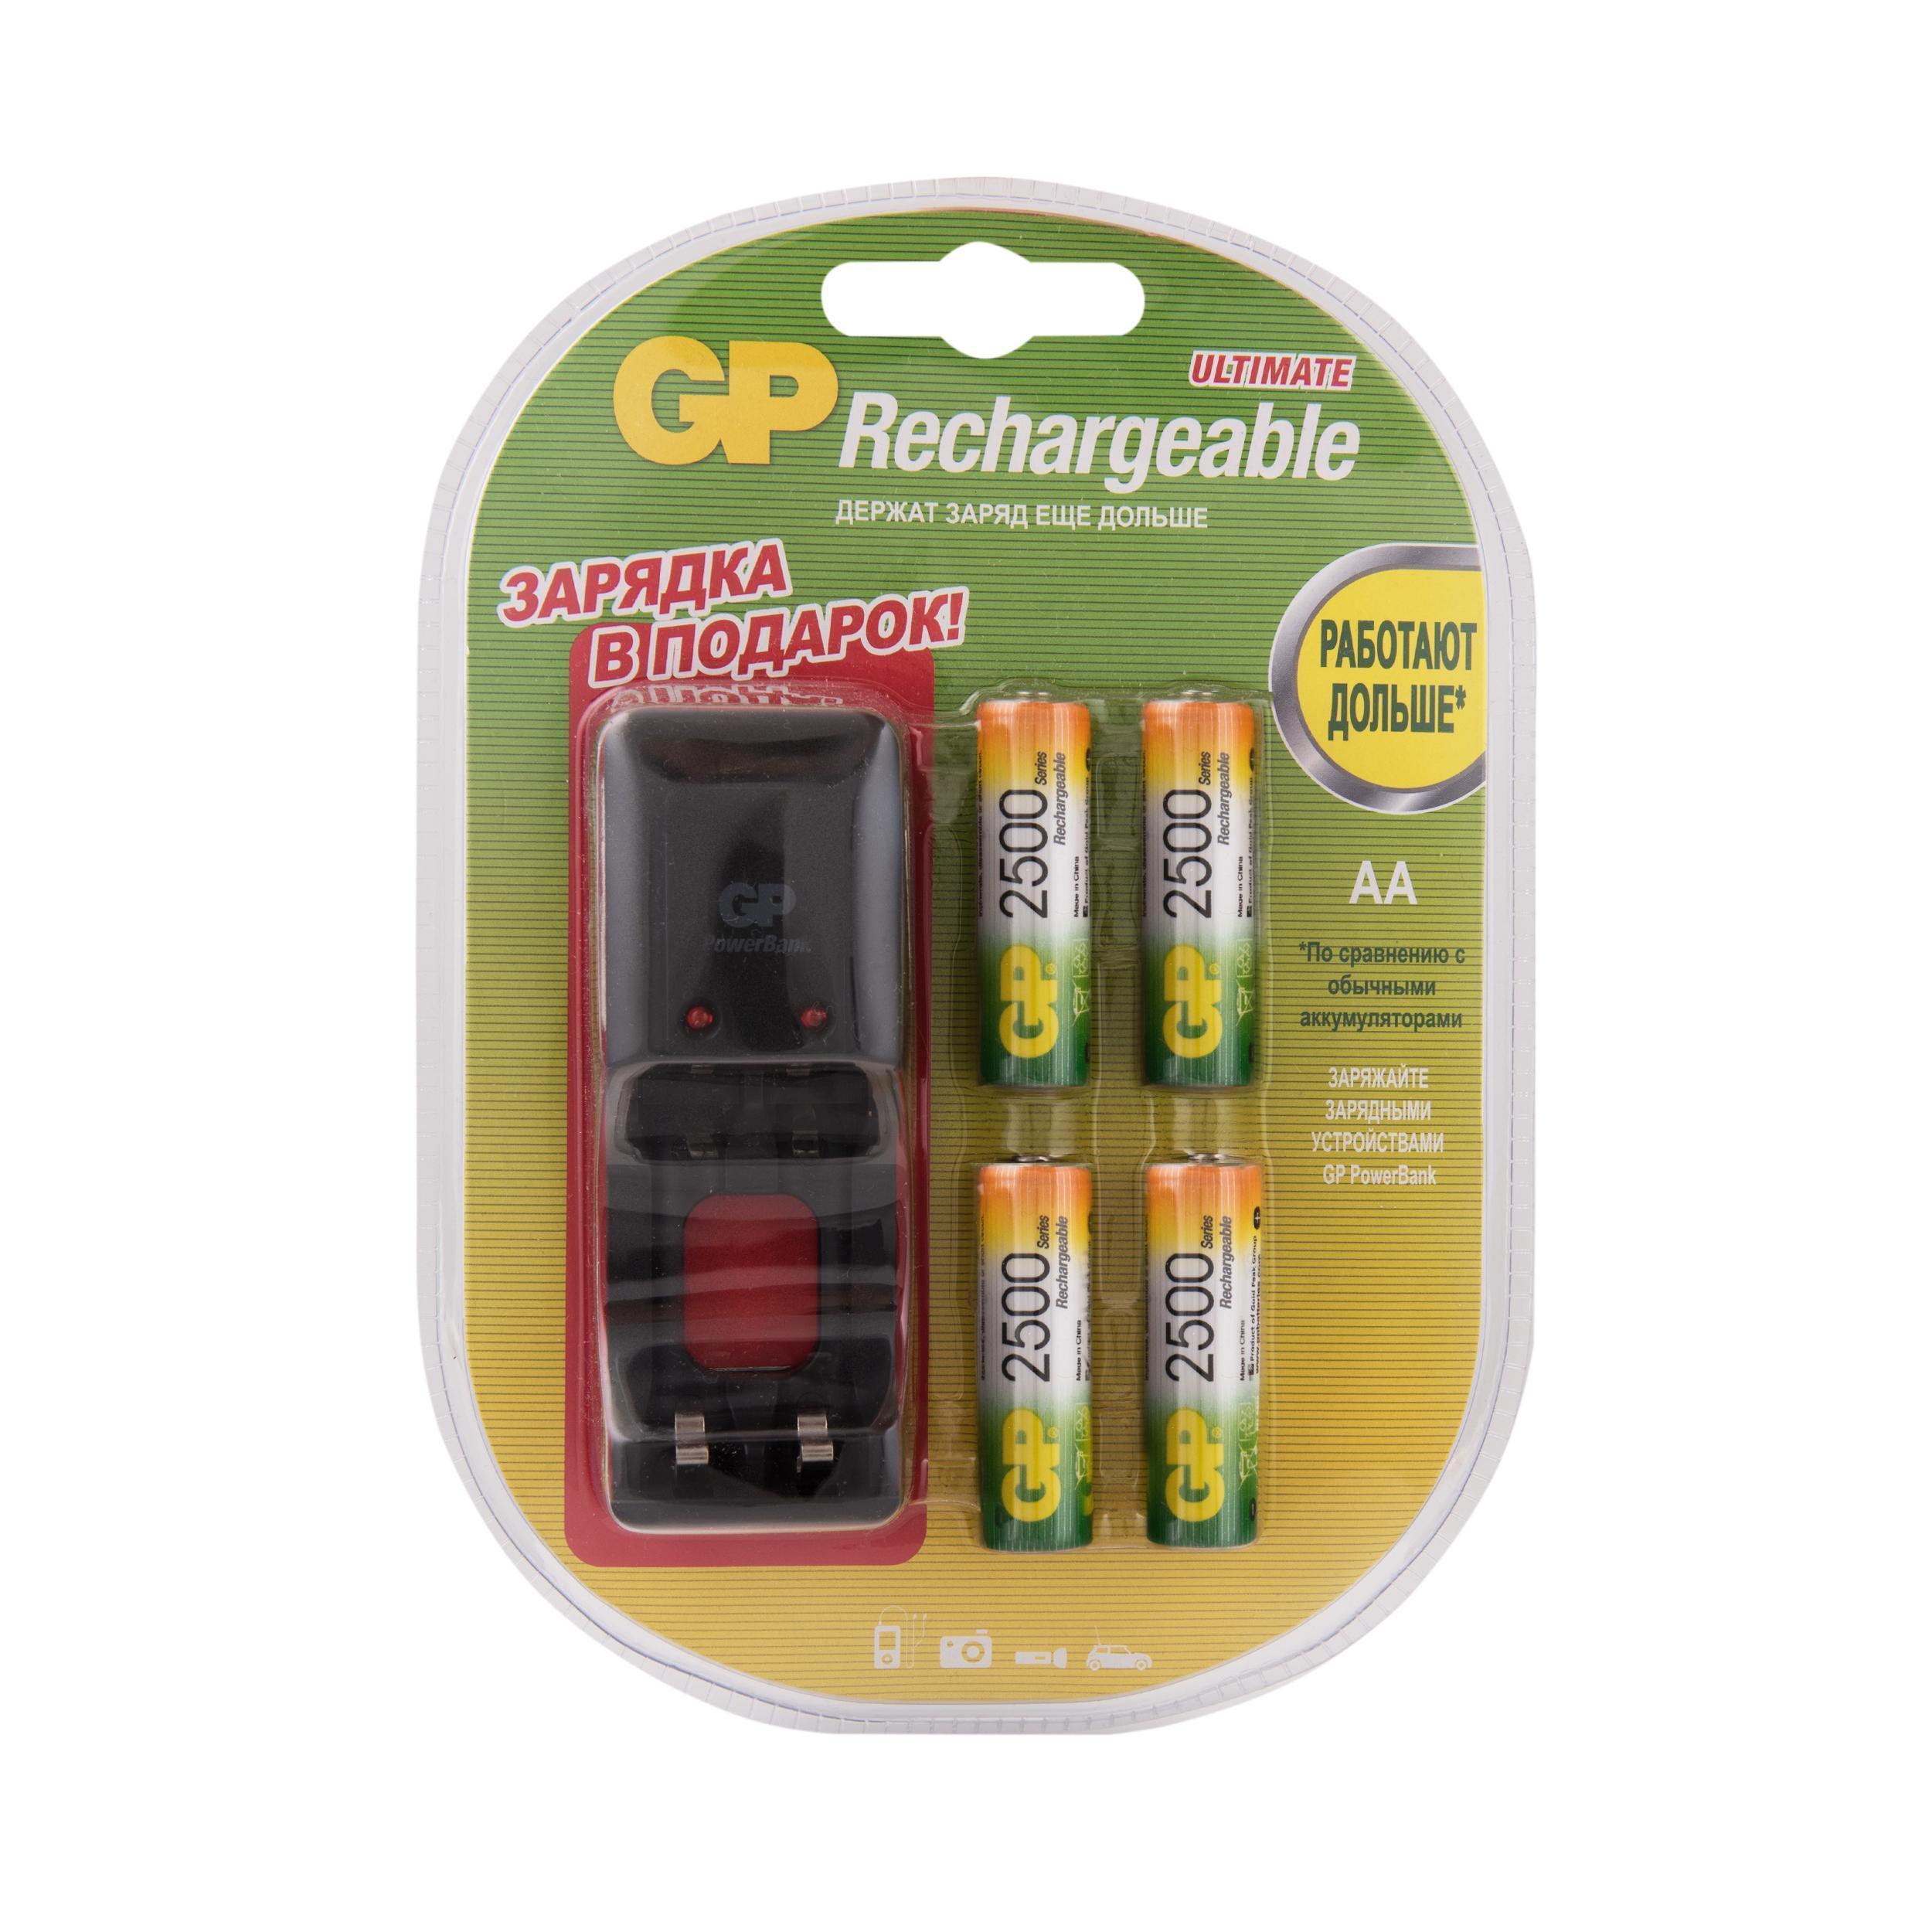 Зарядное устройство GP PB330 + аккумуляторы